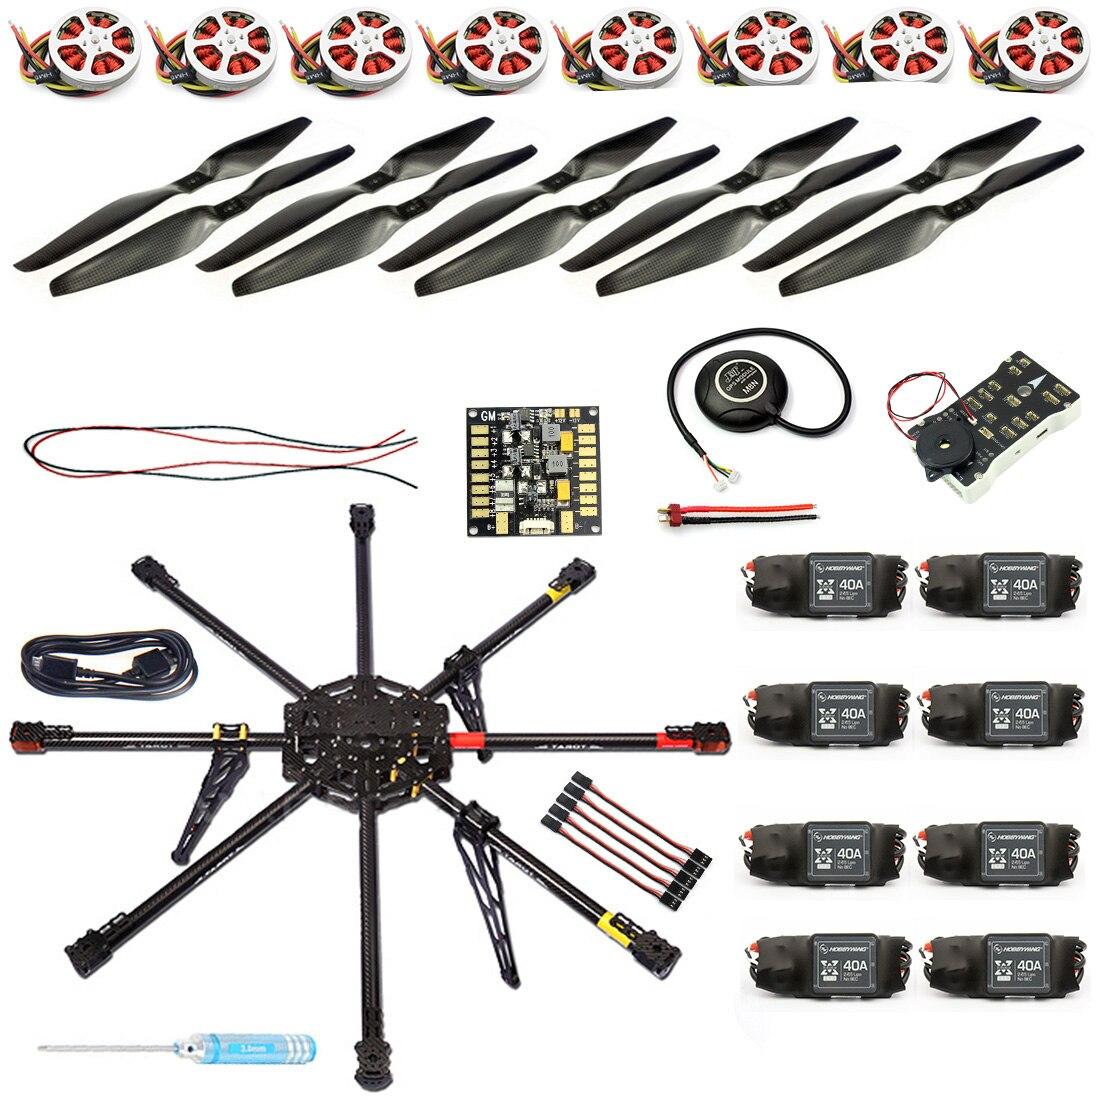 JMT DIY 8-Achse Unmontiert RC Drone 1000mm Carbon Octocopter PX4 PIX M8N GPS RC Drone PNF Kit keine Fernbedienung Batterie FPV F04765-B